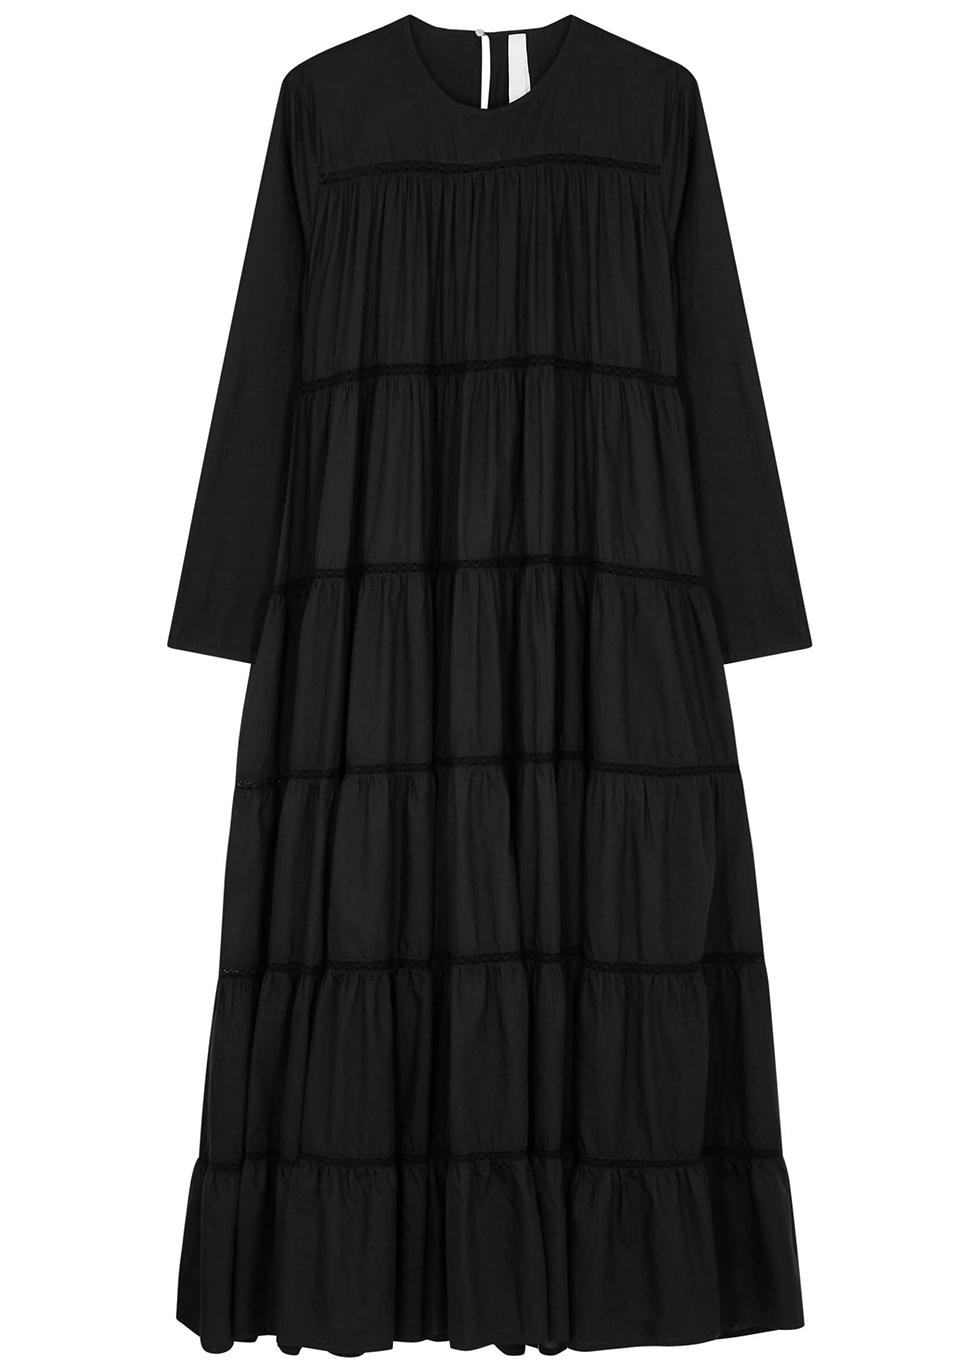 Maida black tiered cotton-blend dress